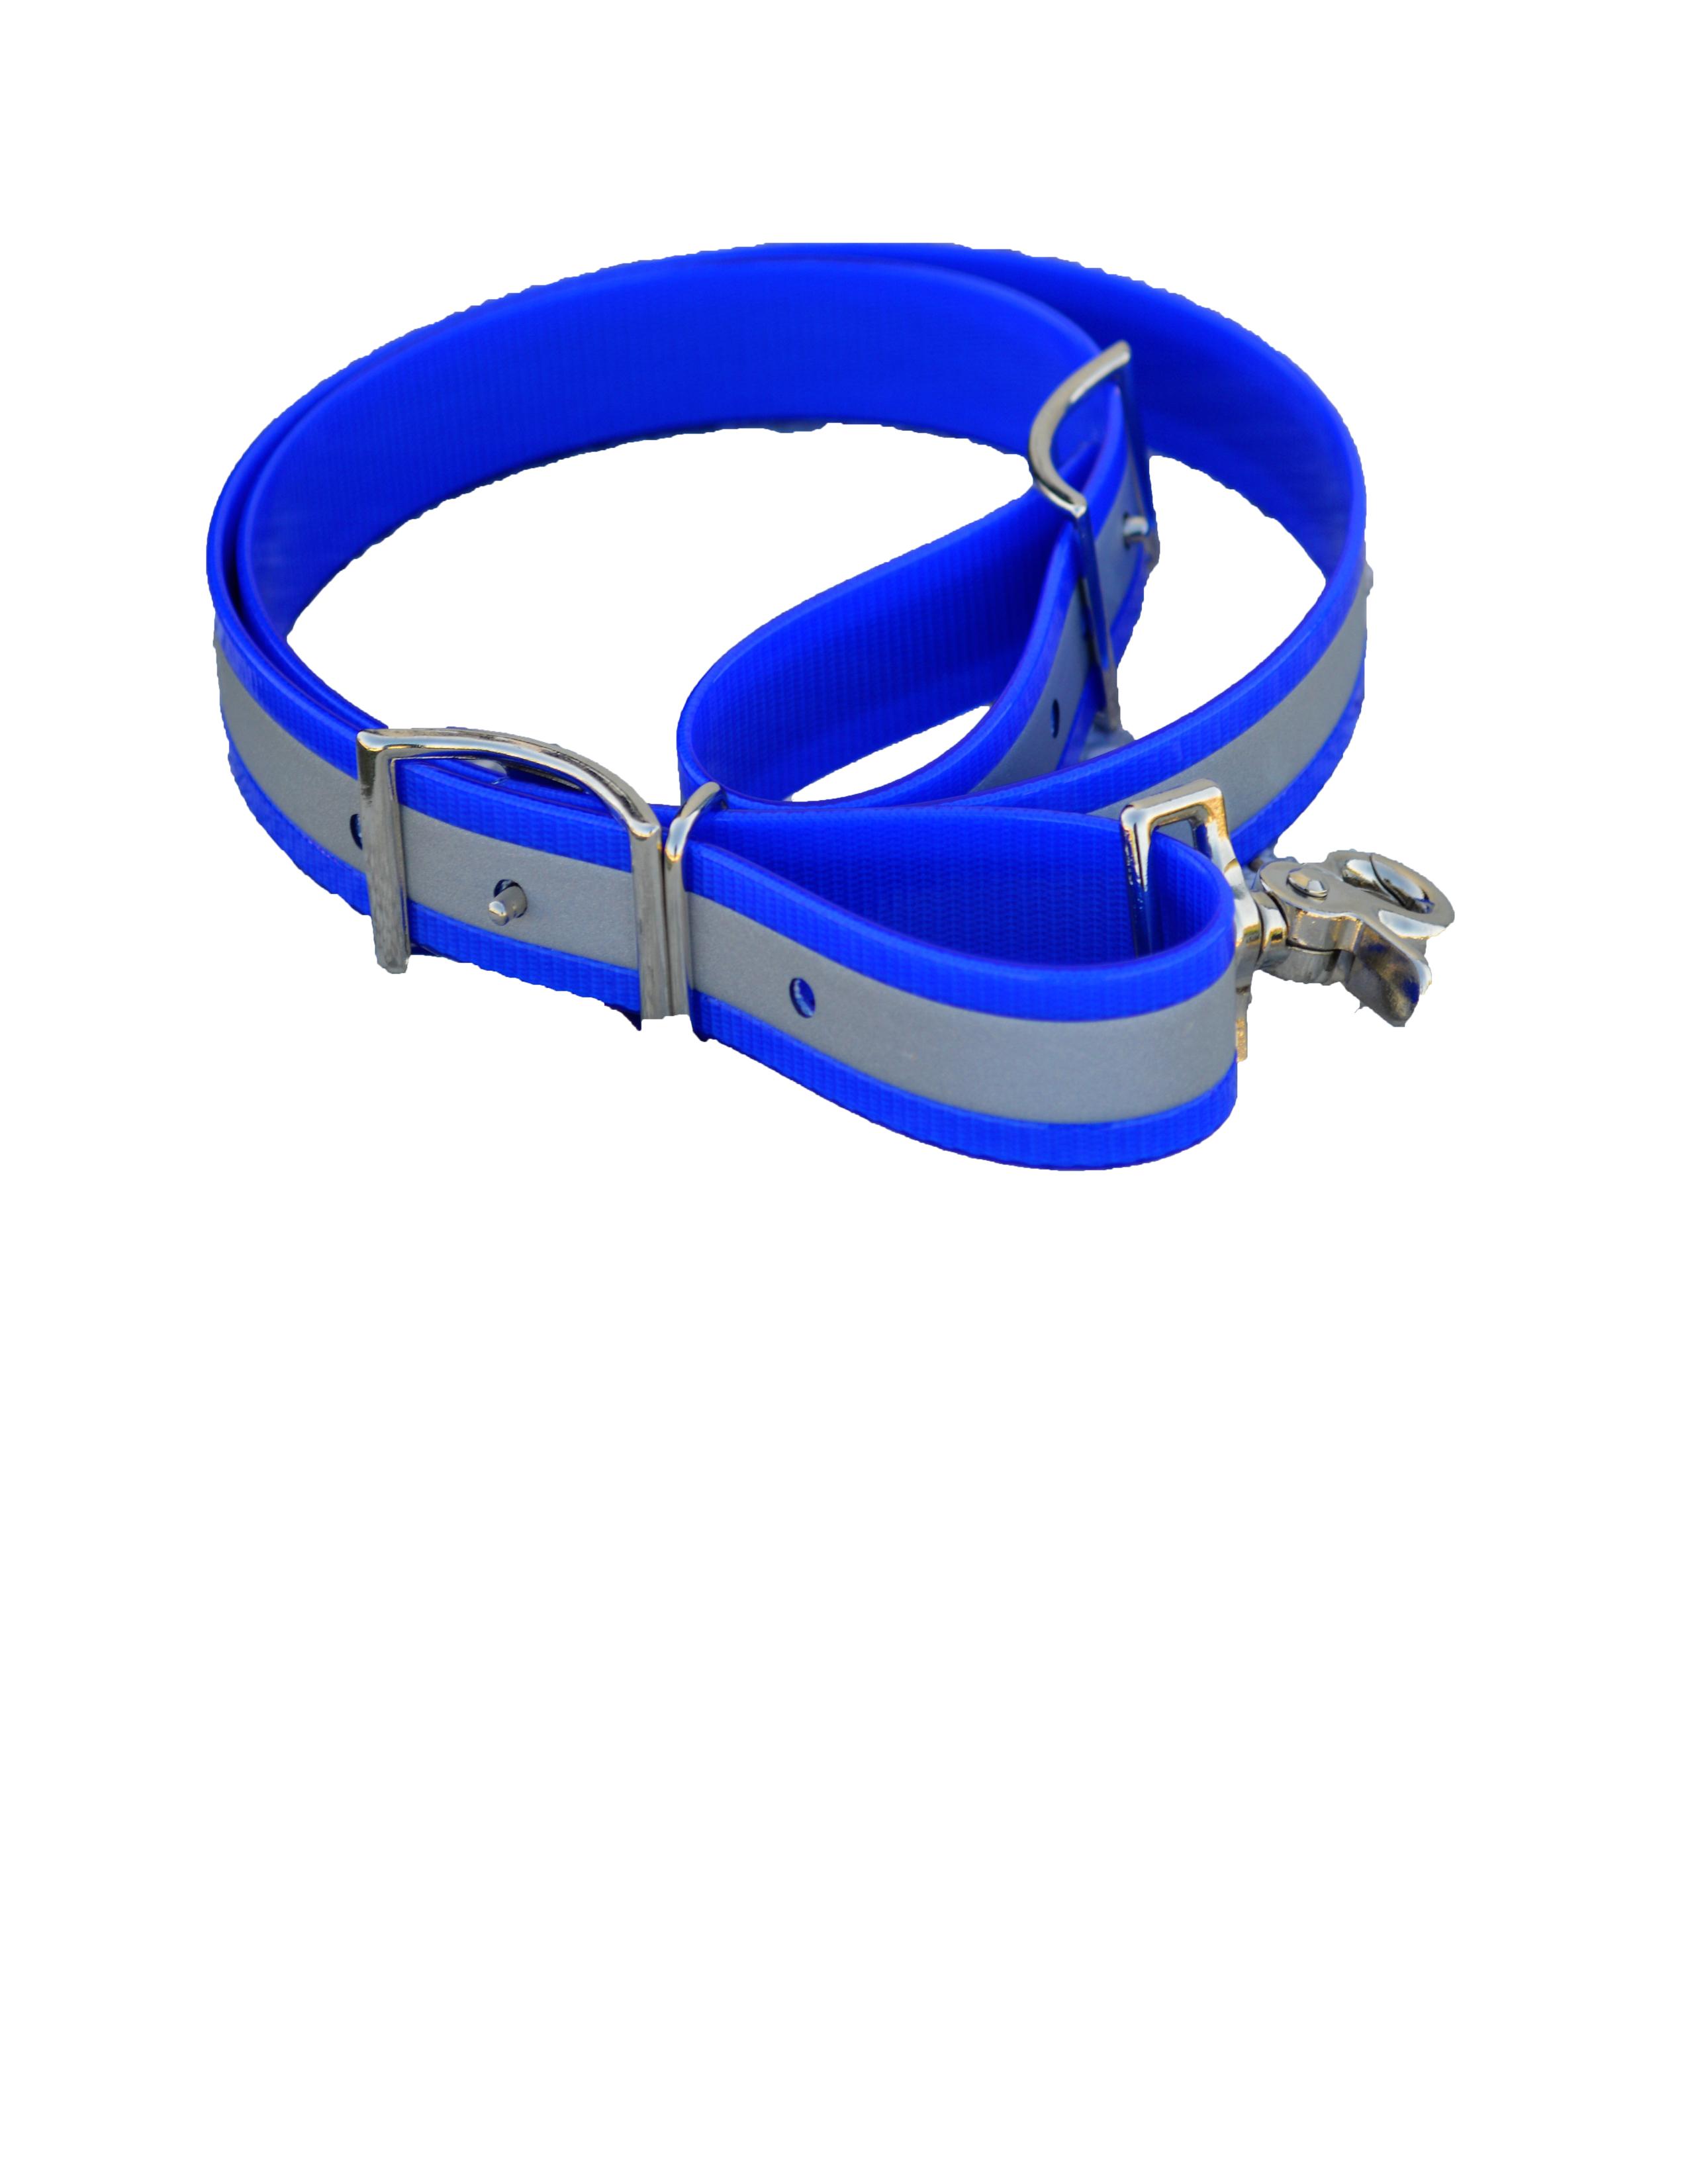 733 BIO Thane Tie Down Blue/Green